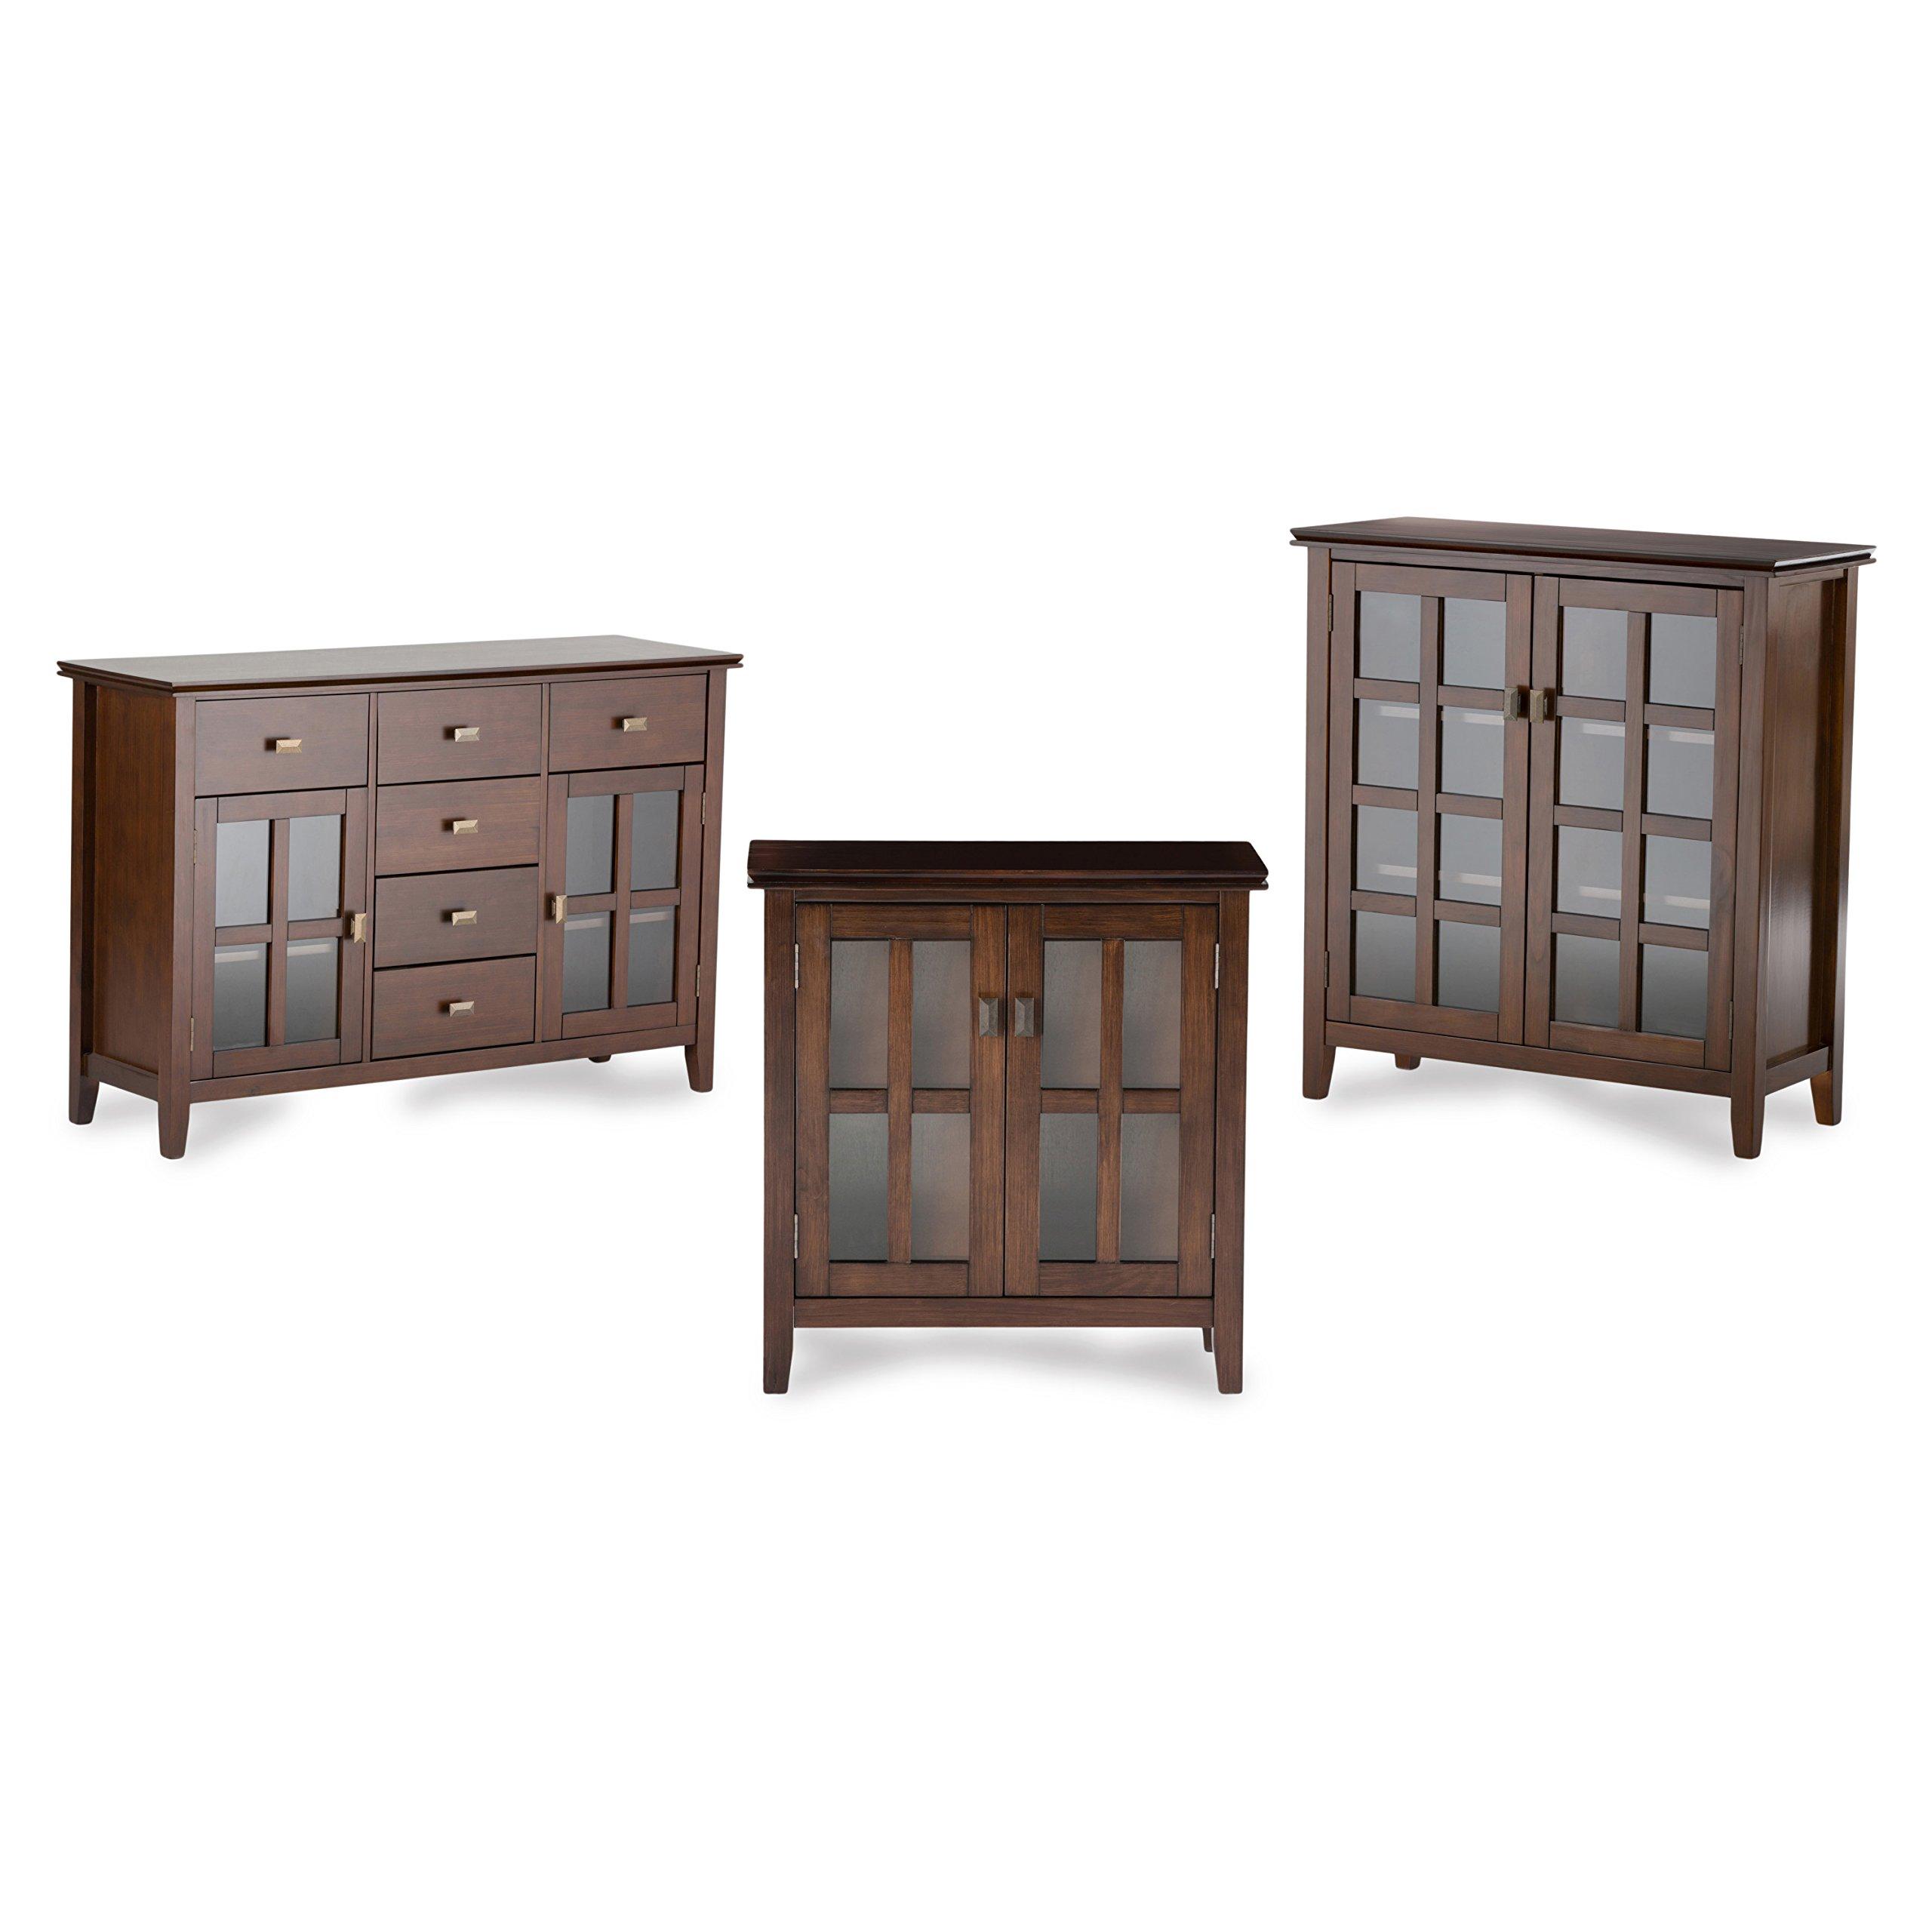 Simpli Home Artisan Solid Wood Low Storage Cabinet, Medium Auburn Brown by Simpli Home (Image #5)